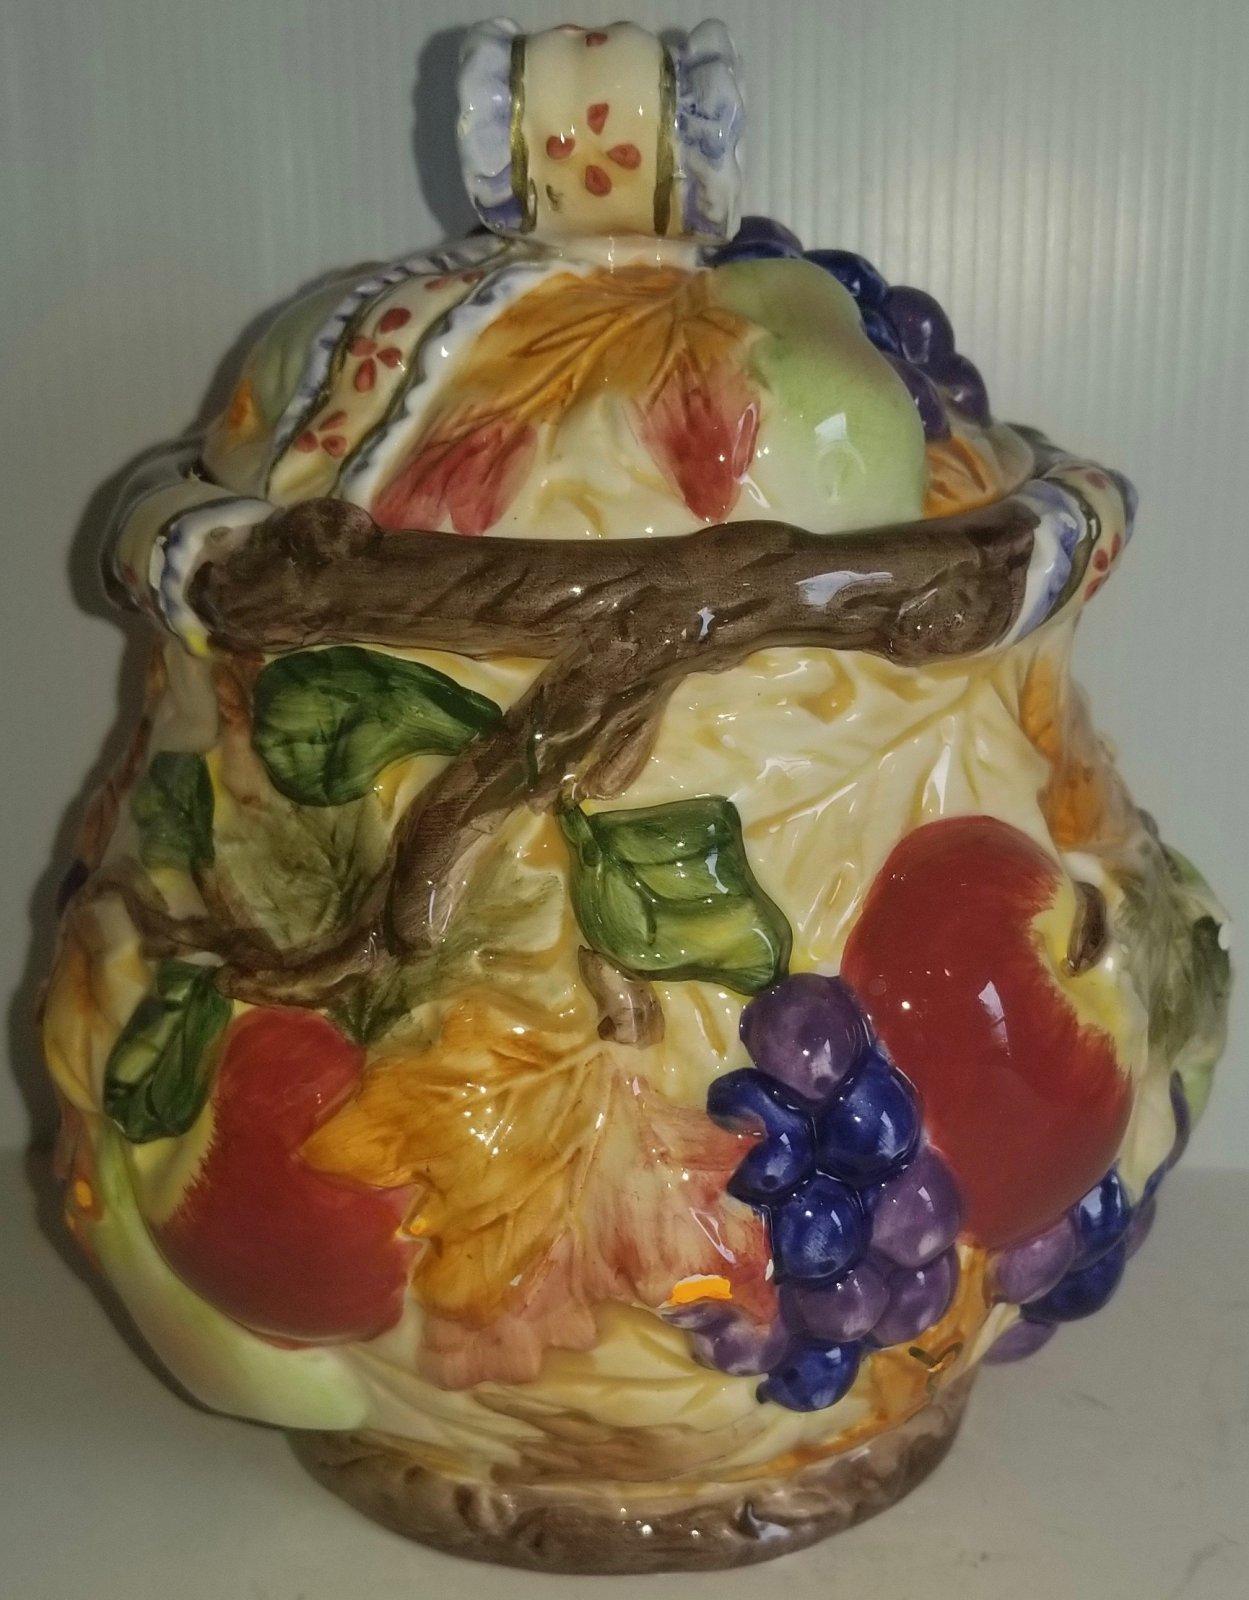 20th century Italian cookie jar with lid